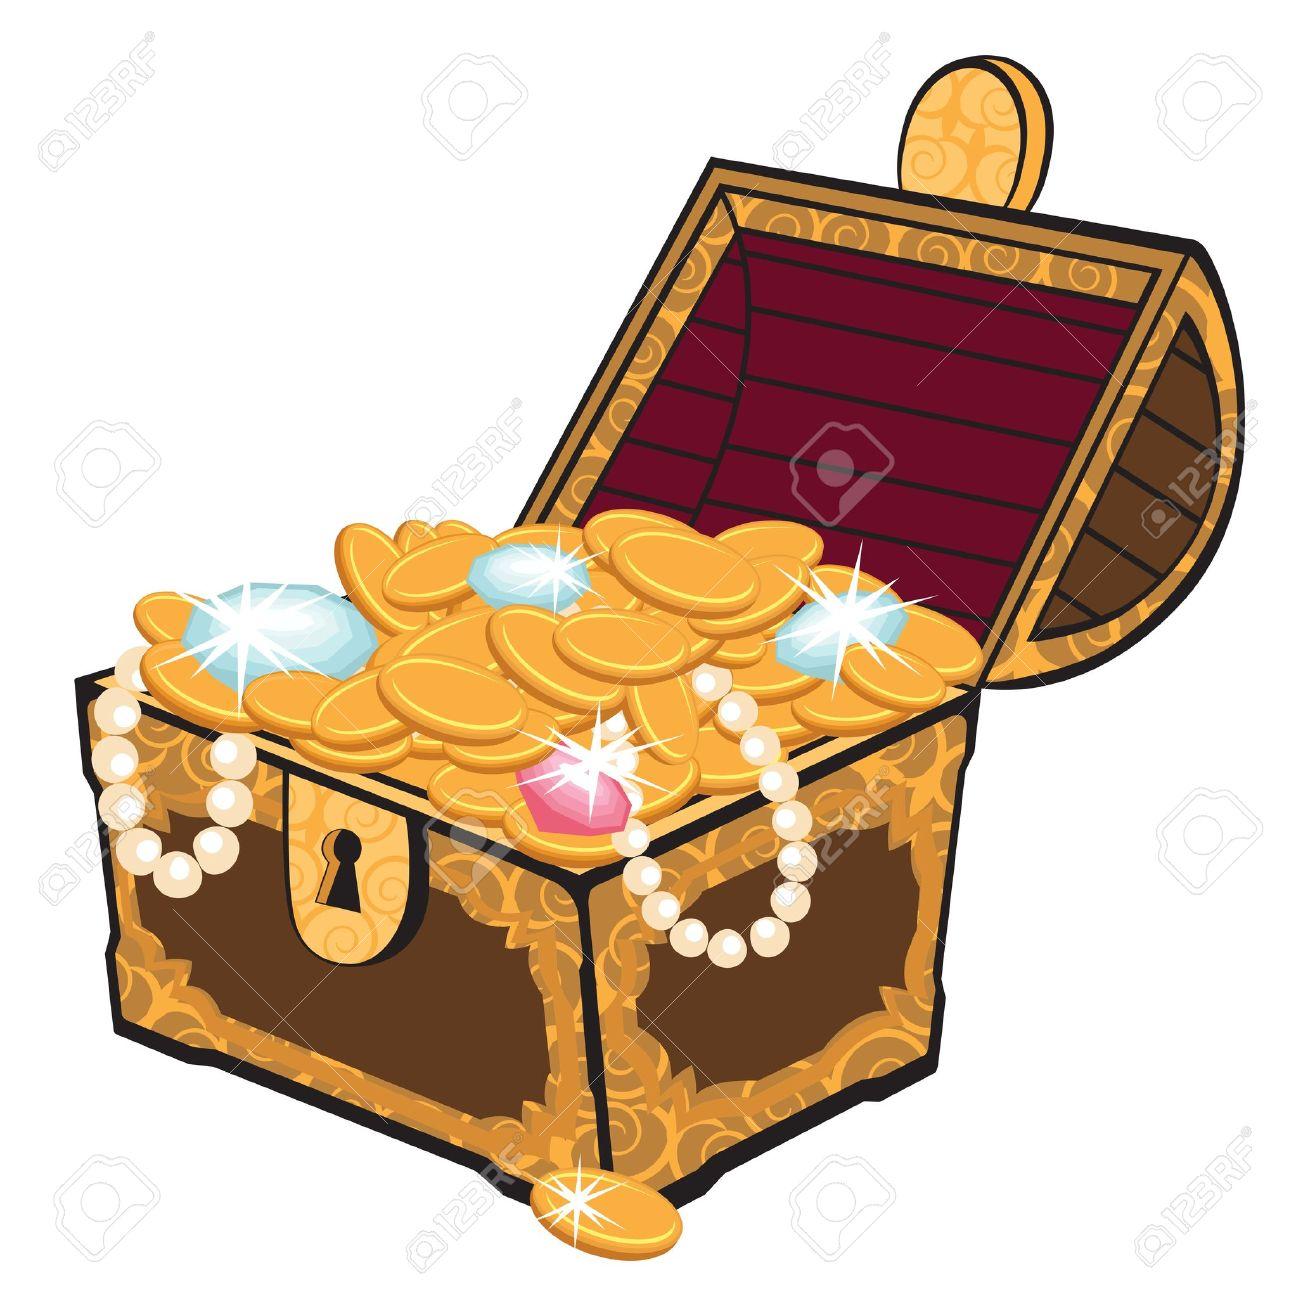 treasure chest royalty free cliparts vectors and stock rh 123rf com treasure chest vector download treasure chest vector icon